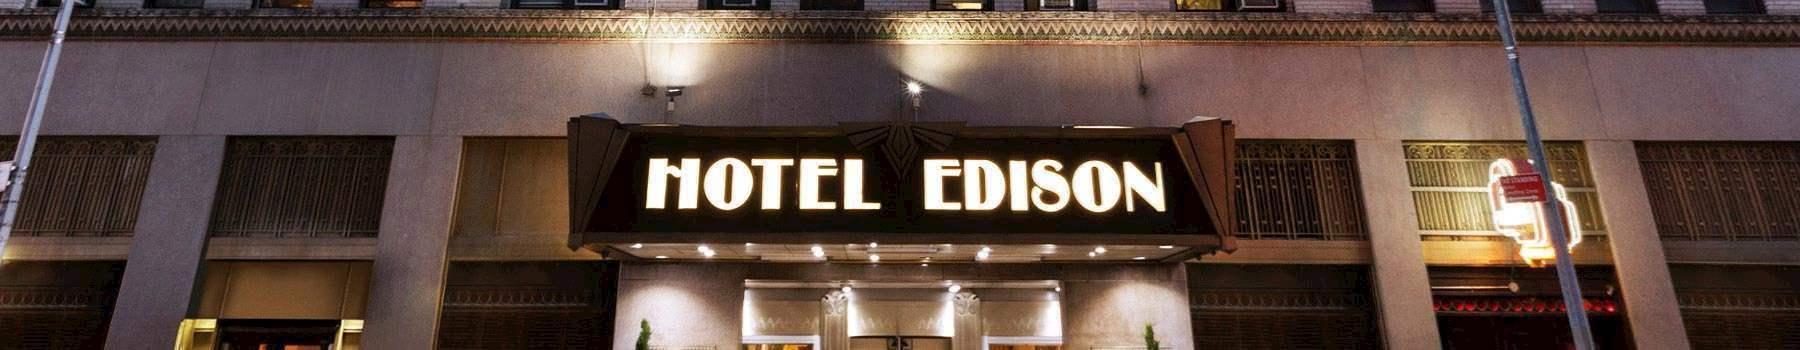 Careers of Hotel Edition Newyork top